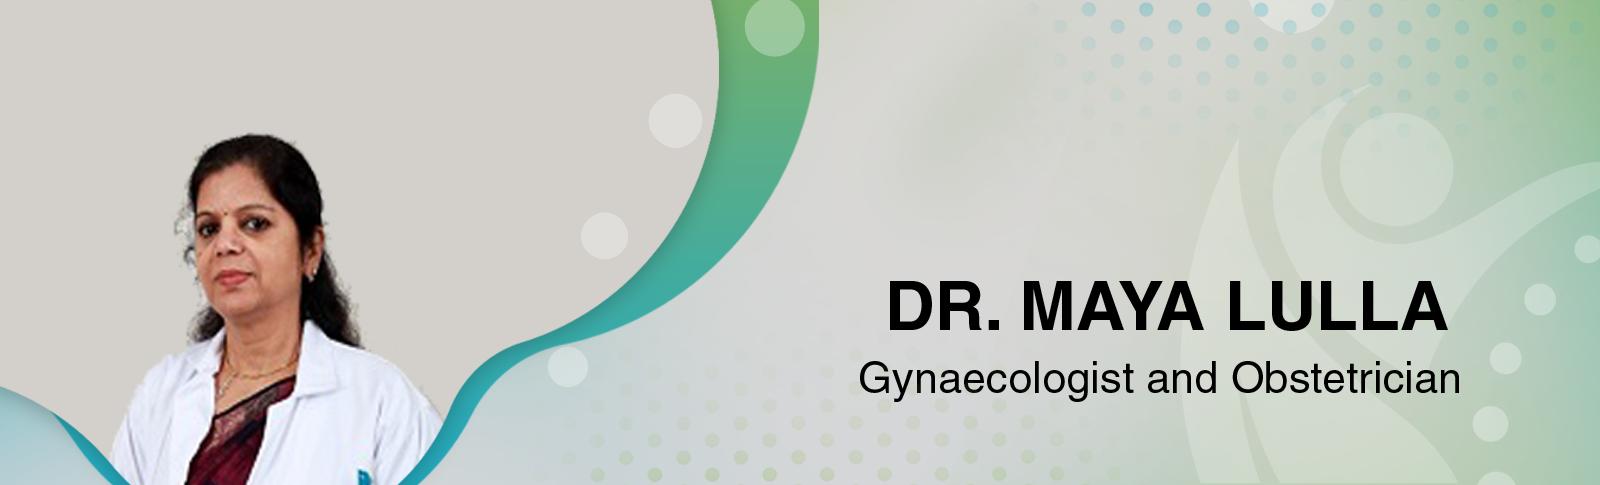 Dr. Maya Lulla